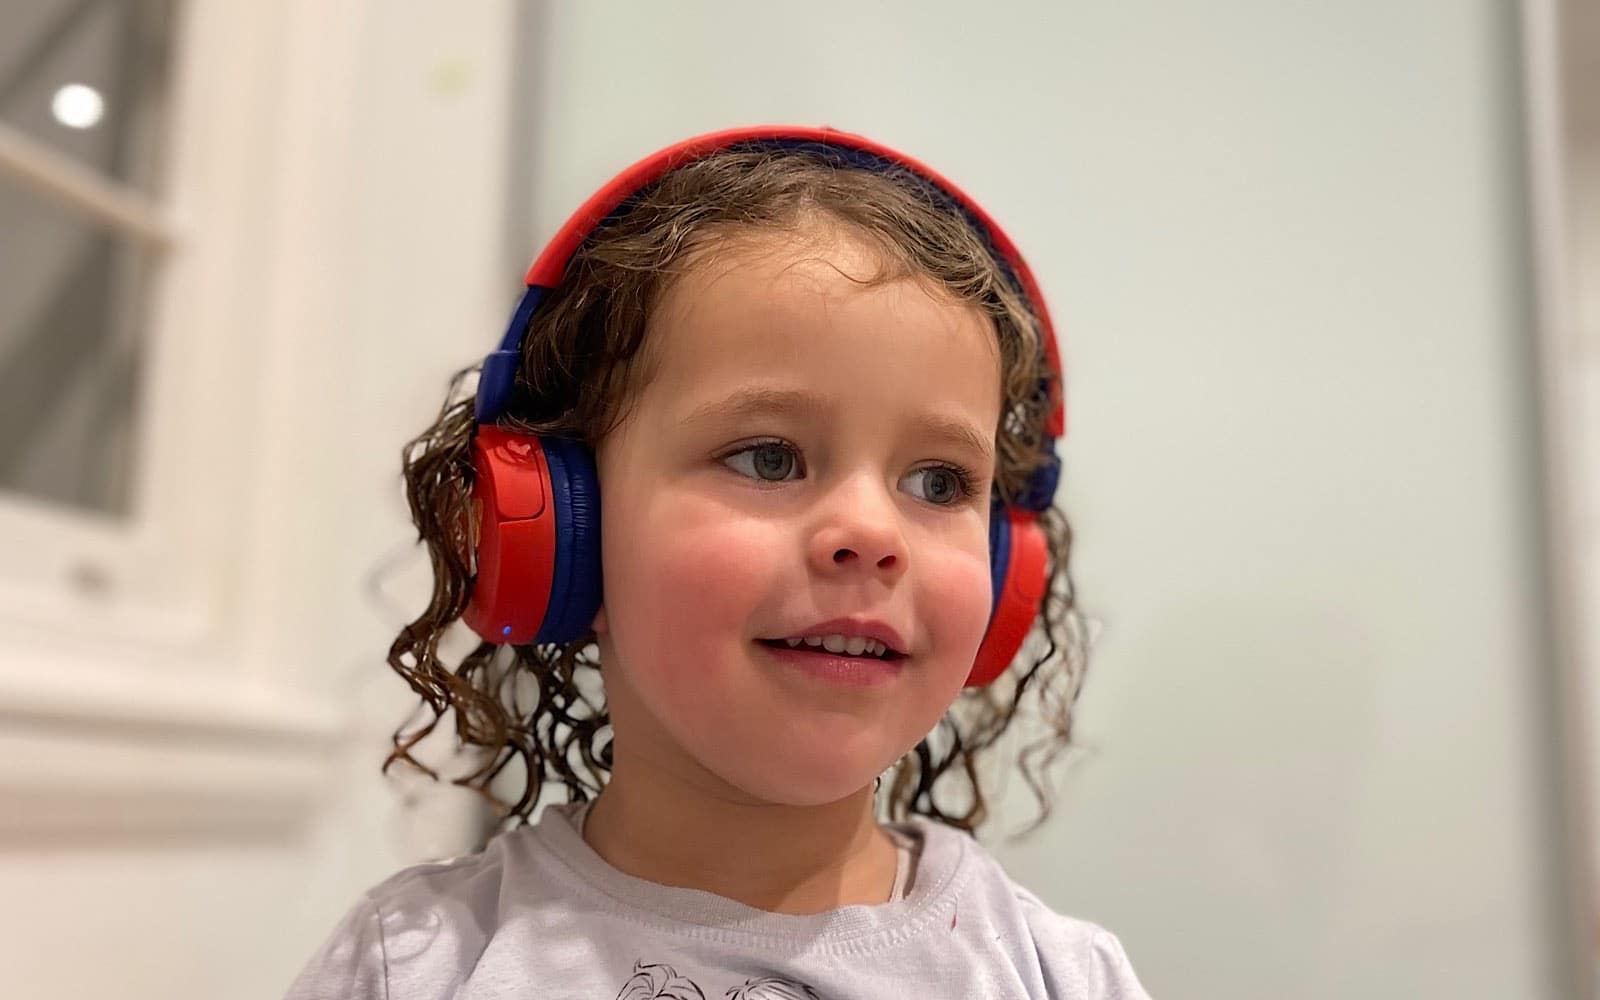 The little one wearing the JBL JR310BT headphones.